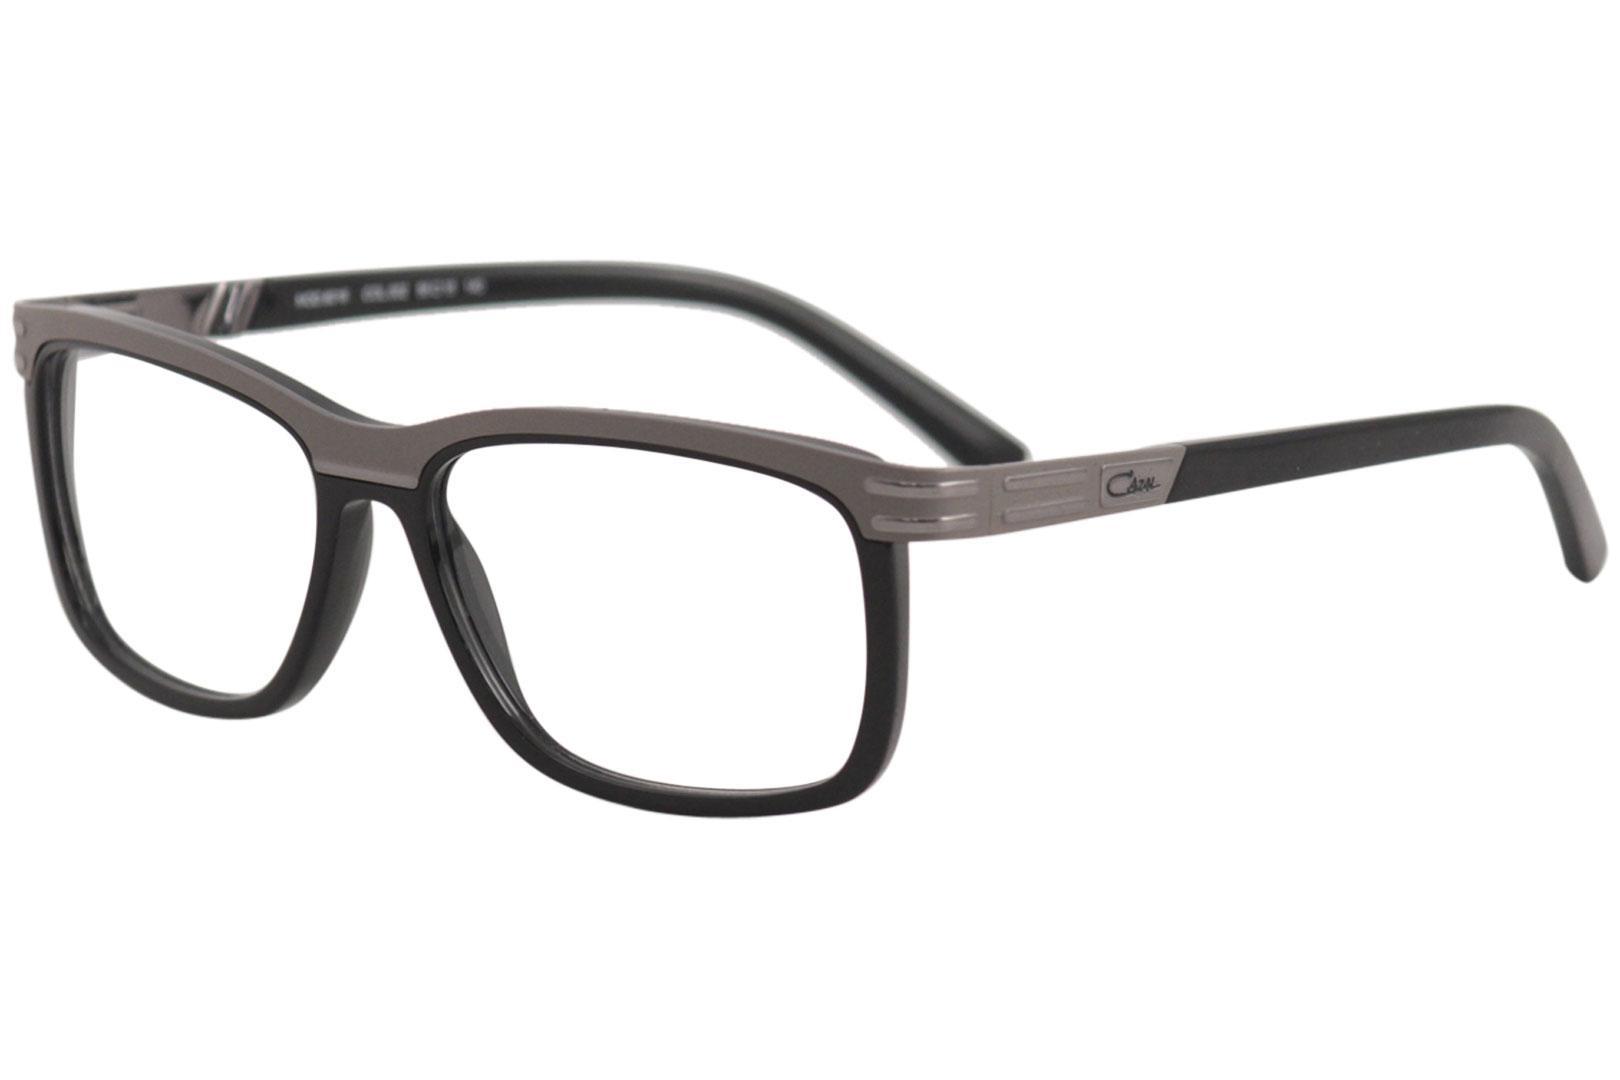 db408cf2b821 Cazal Men's Eyeglasses 6016 002 Grey/Black Full Rim Optical Frame ...